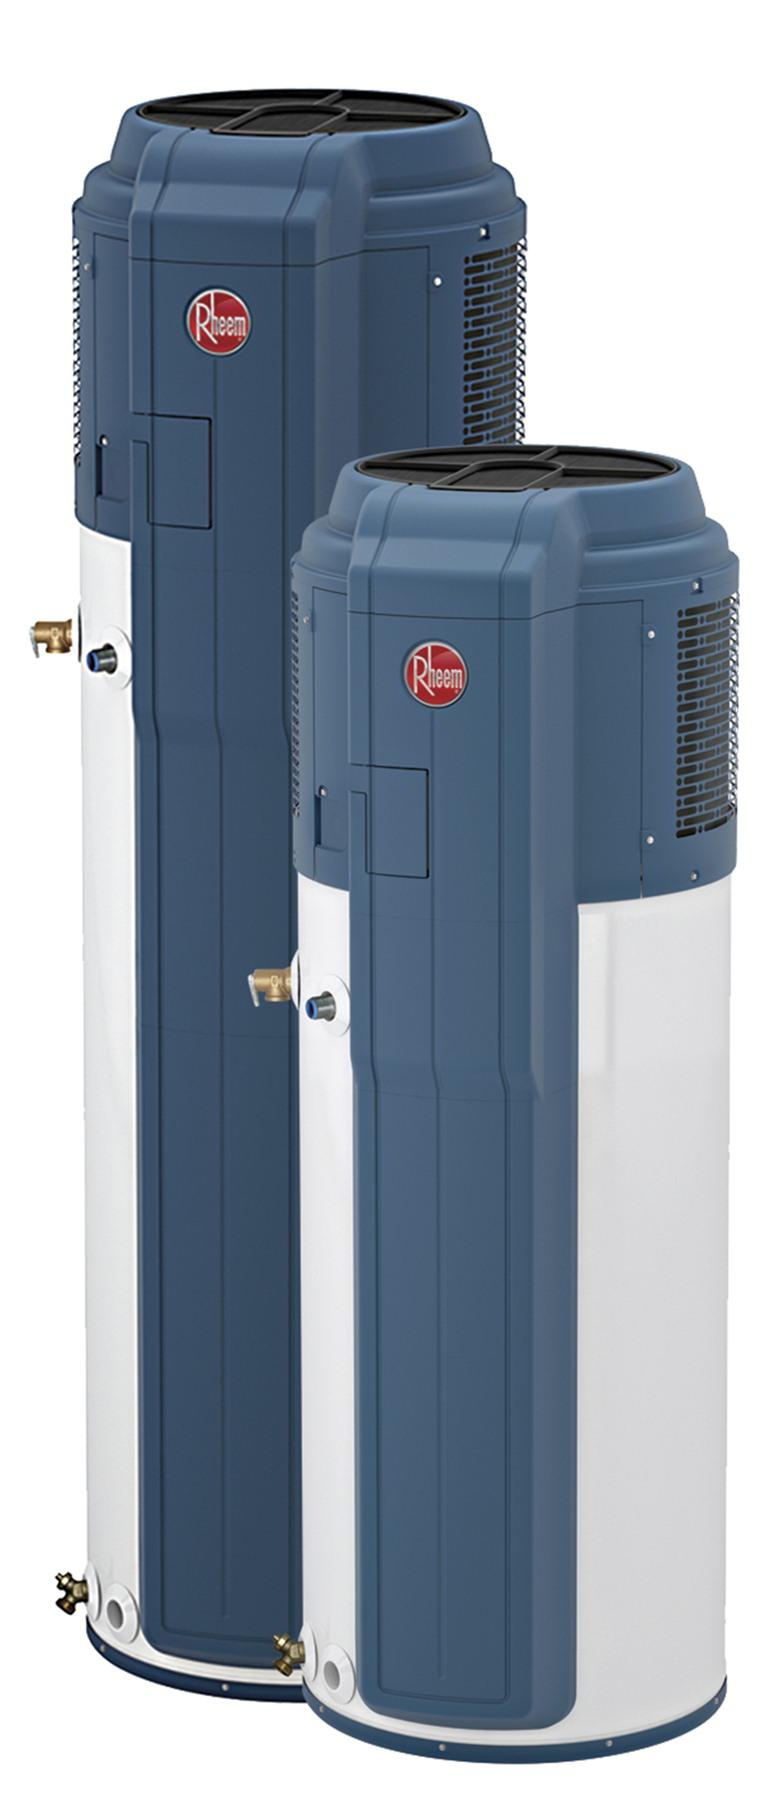 Rheem Hybrid Heat Pump — Khouri Group Green Technologies